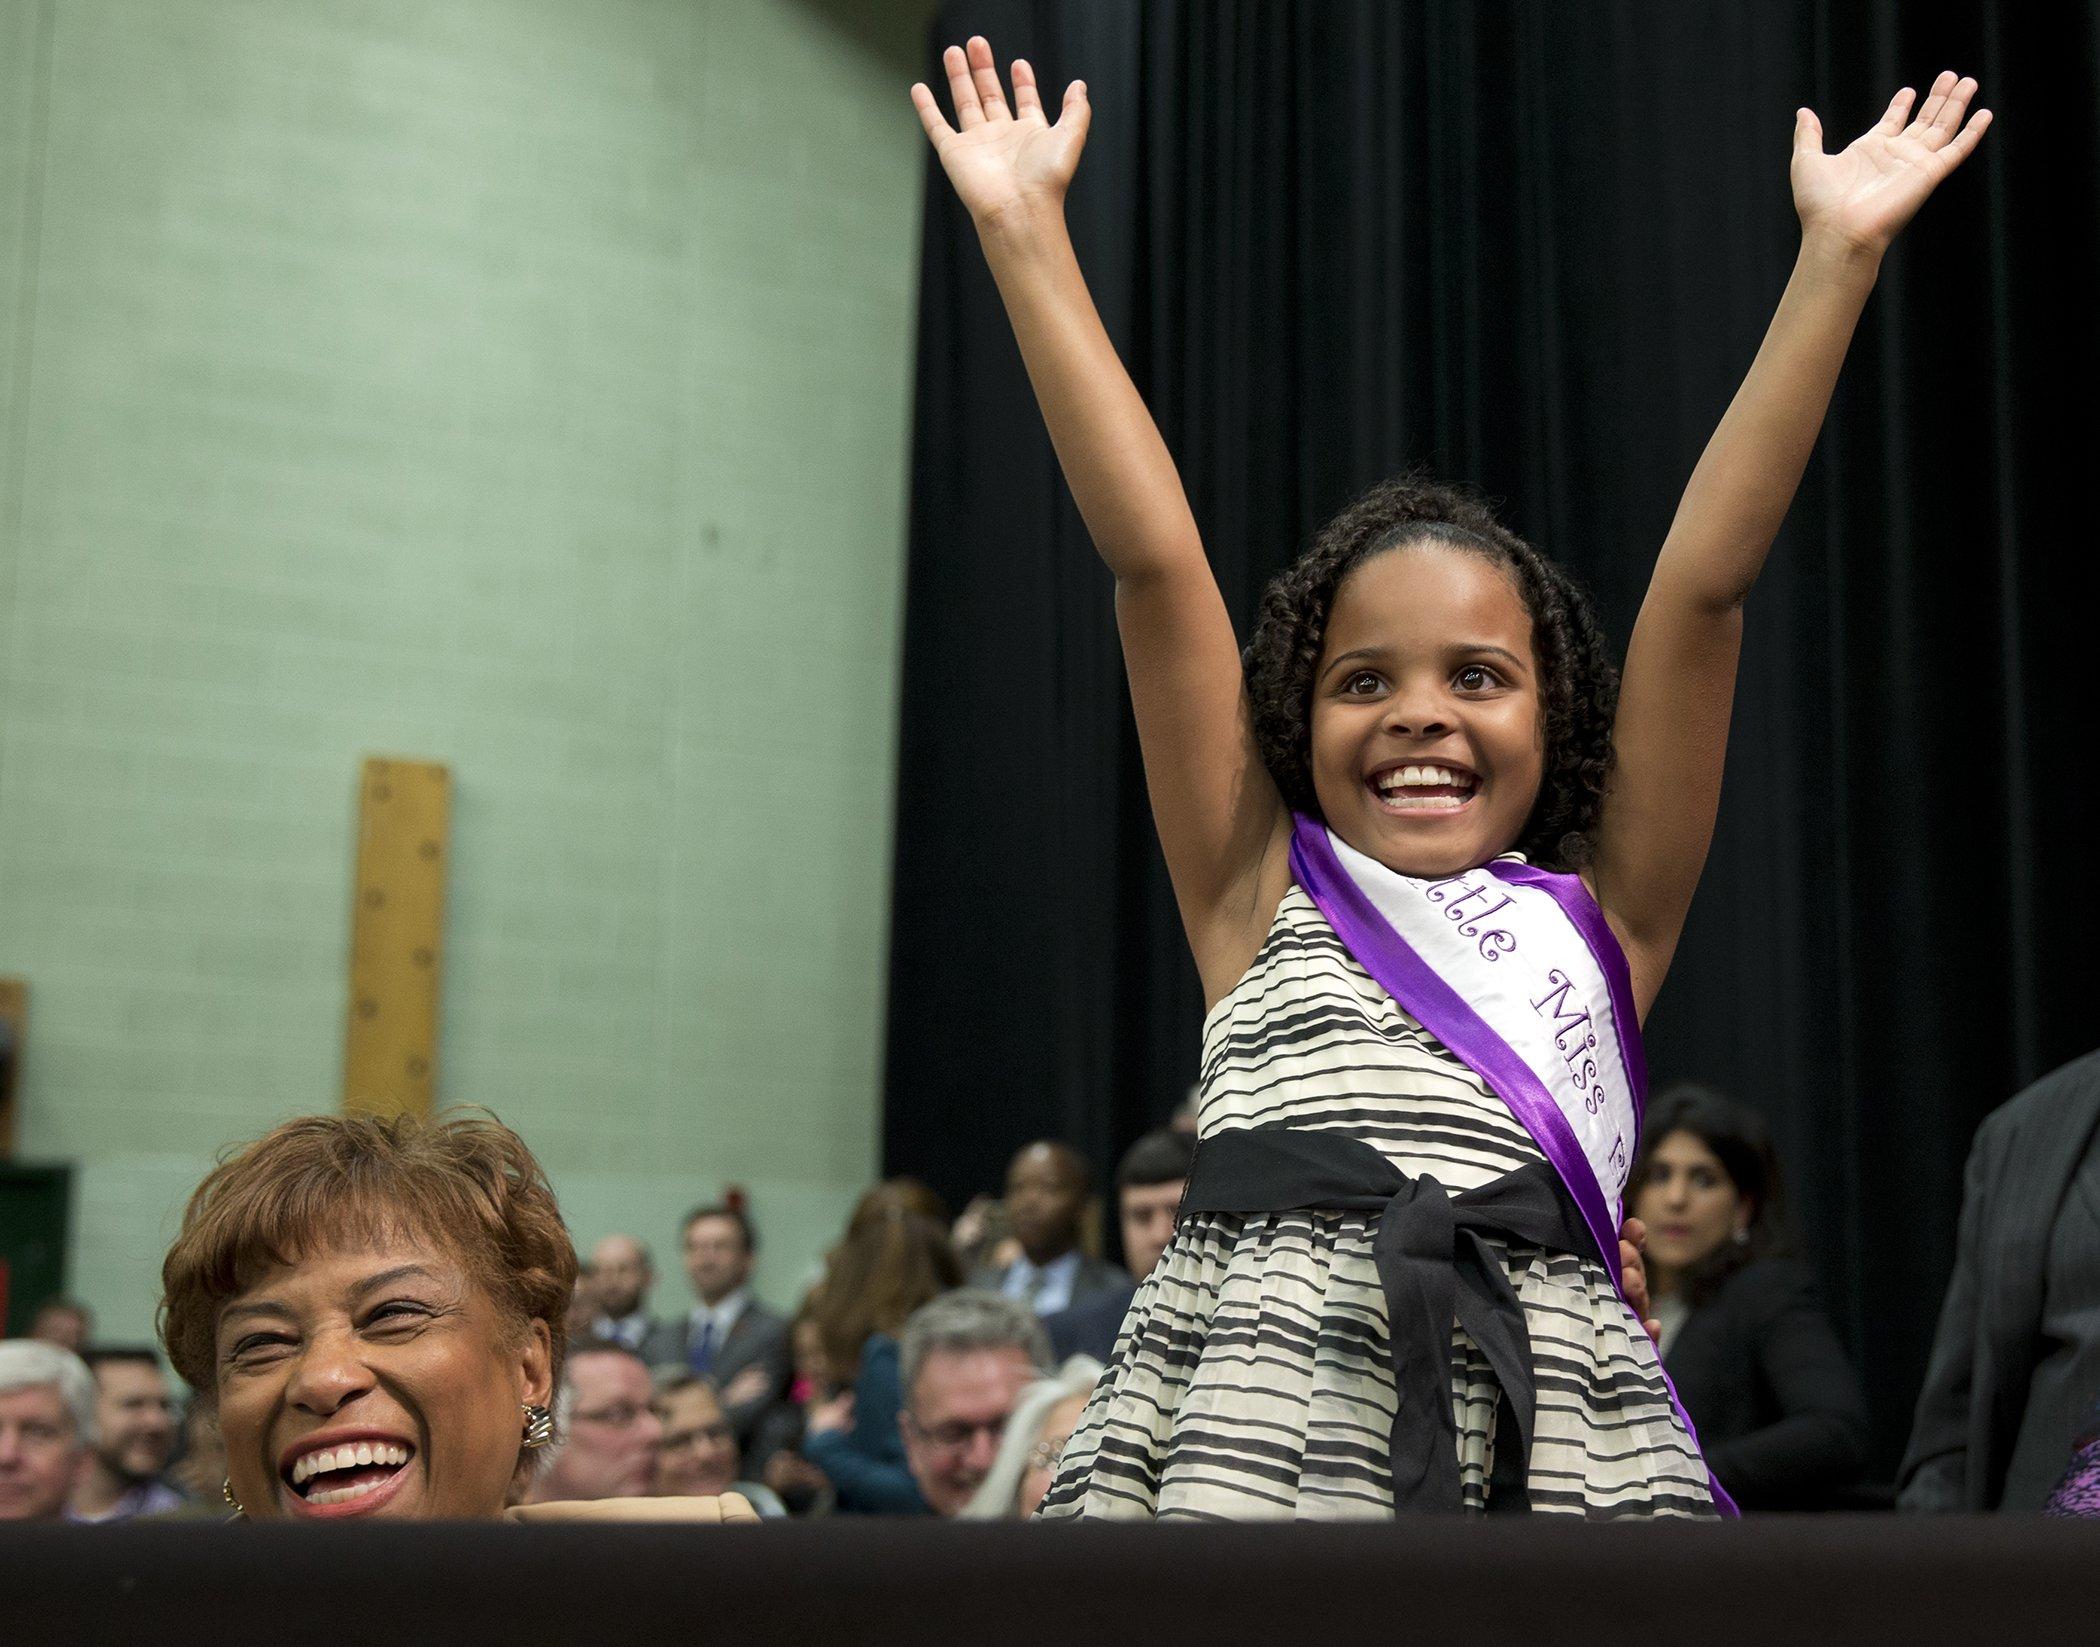 Little-Miss-Flint-Mari-Copeny-Education-MLK-Day.jpg